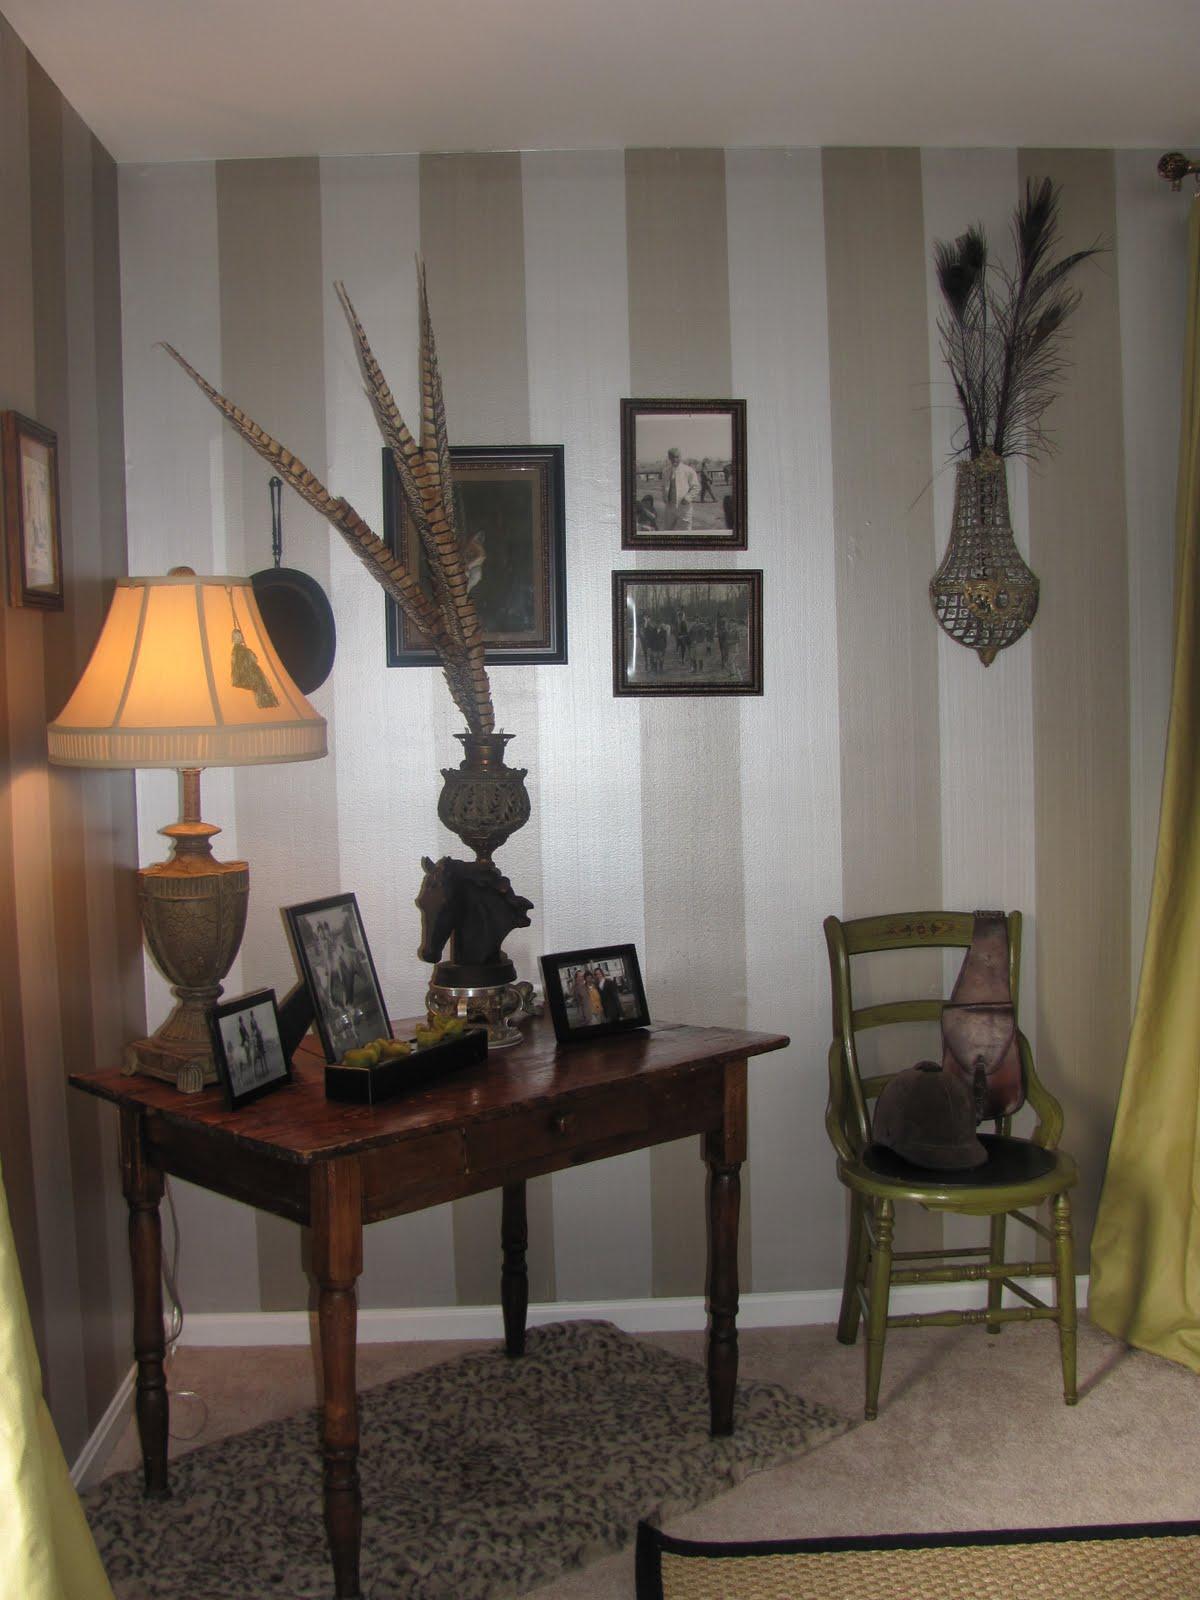 metallic paint home depot home painting ideas. Black Bedroom Furniture Sets. Home Design Ideas